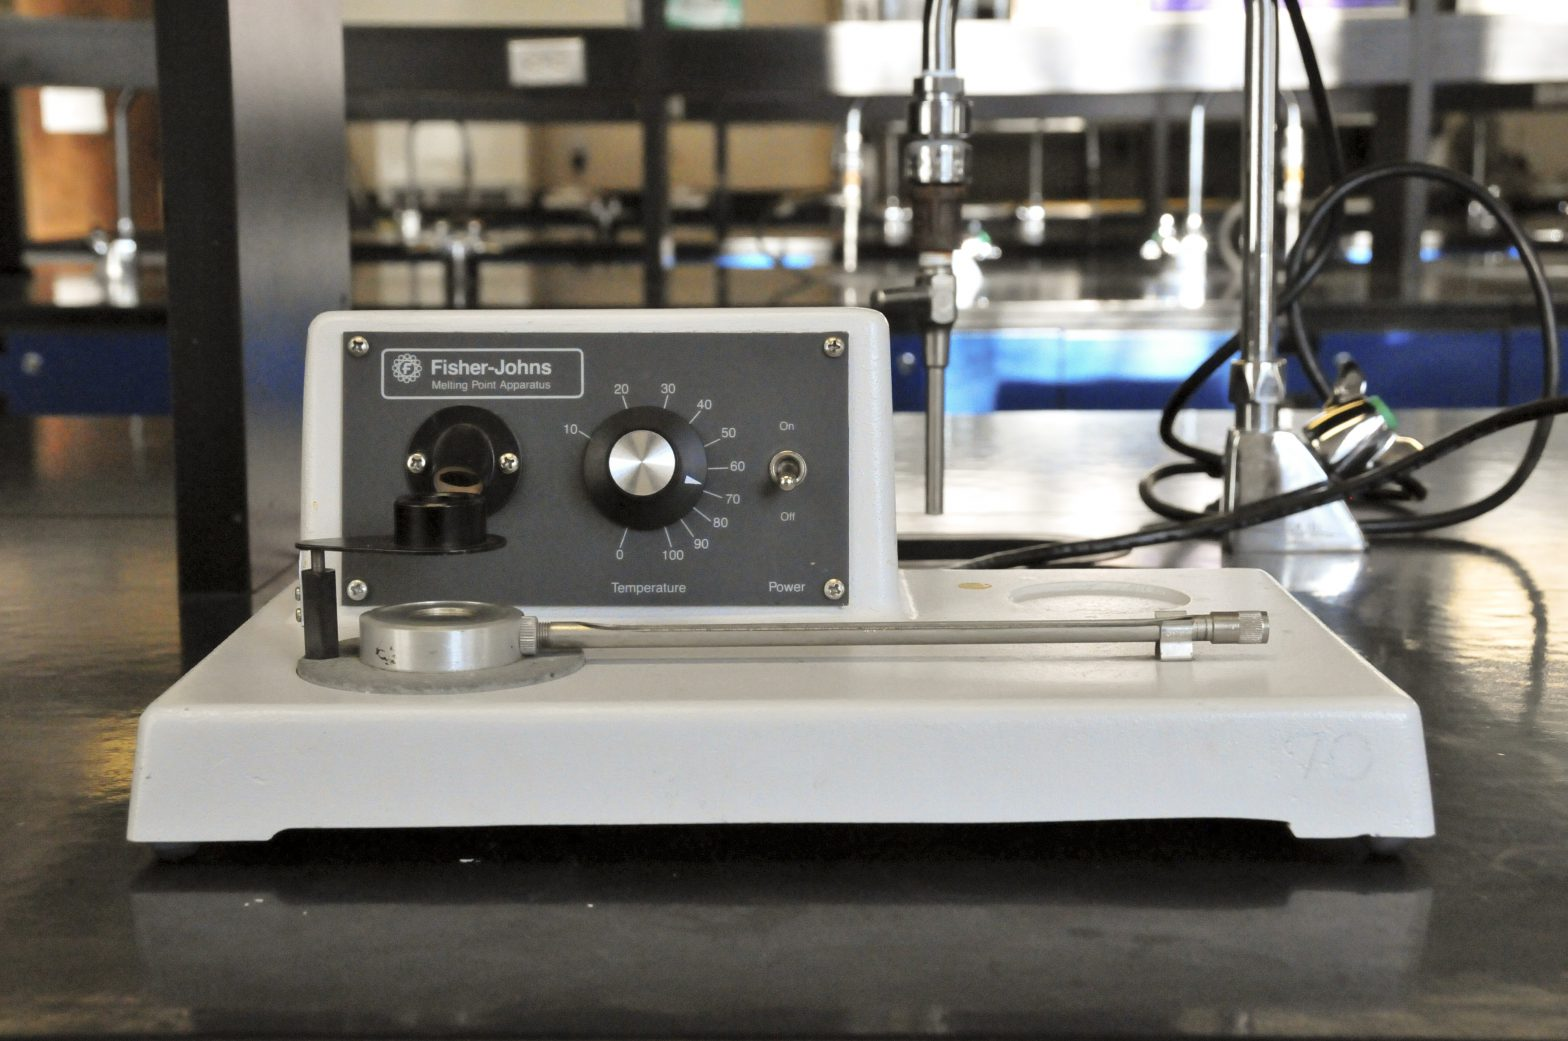 Buy Congeal Chemical Melting Equipment equipment